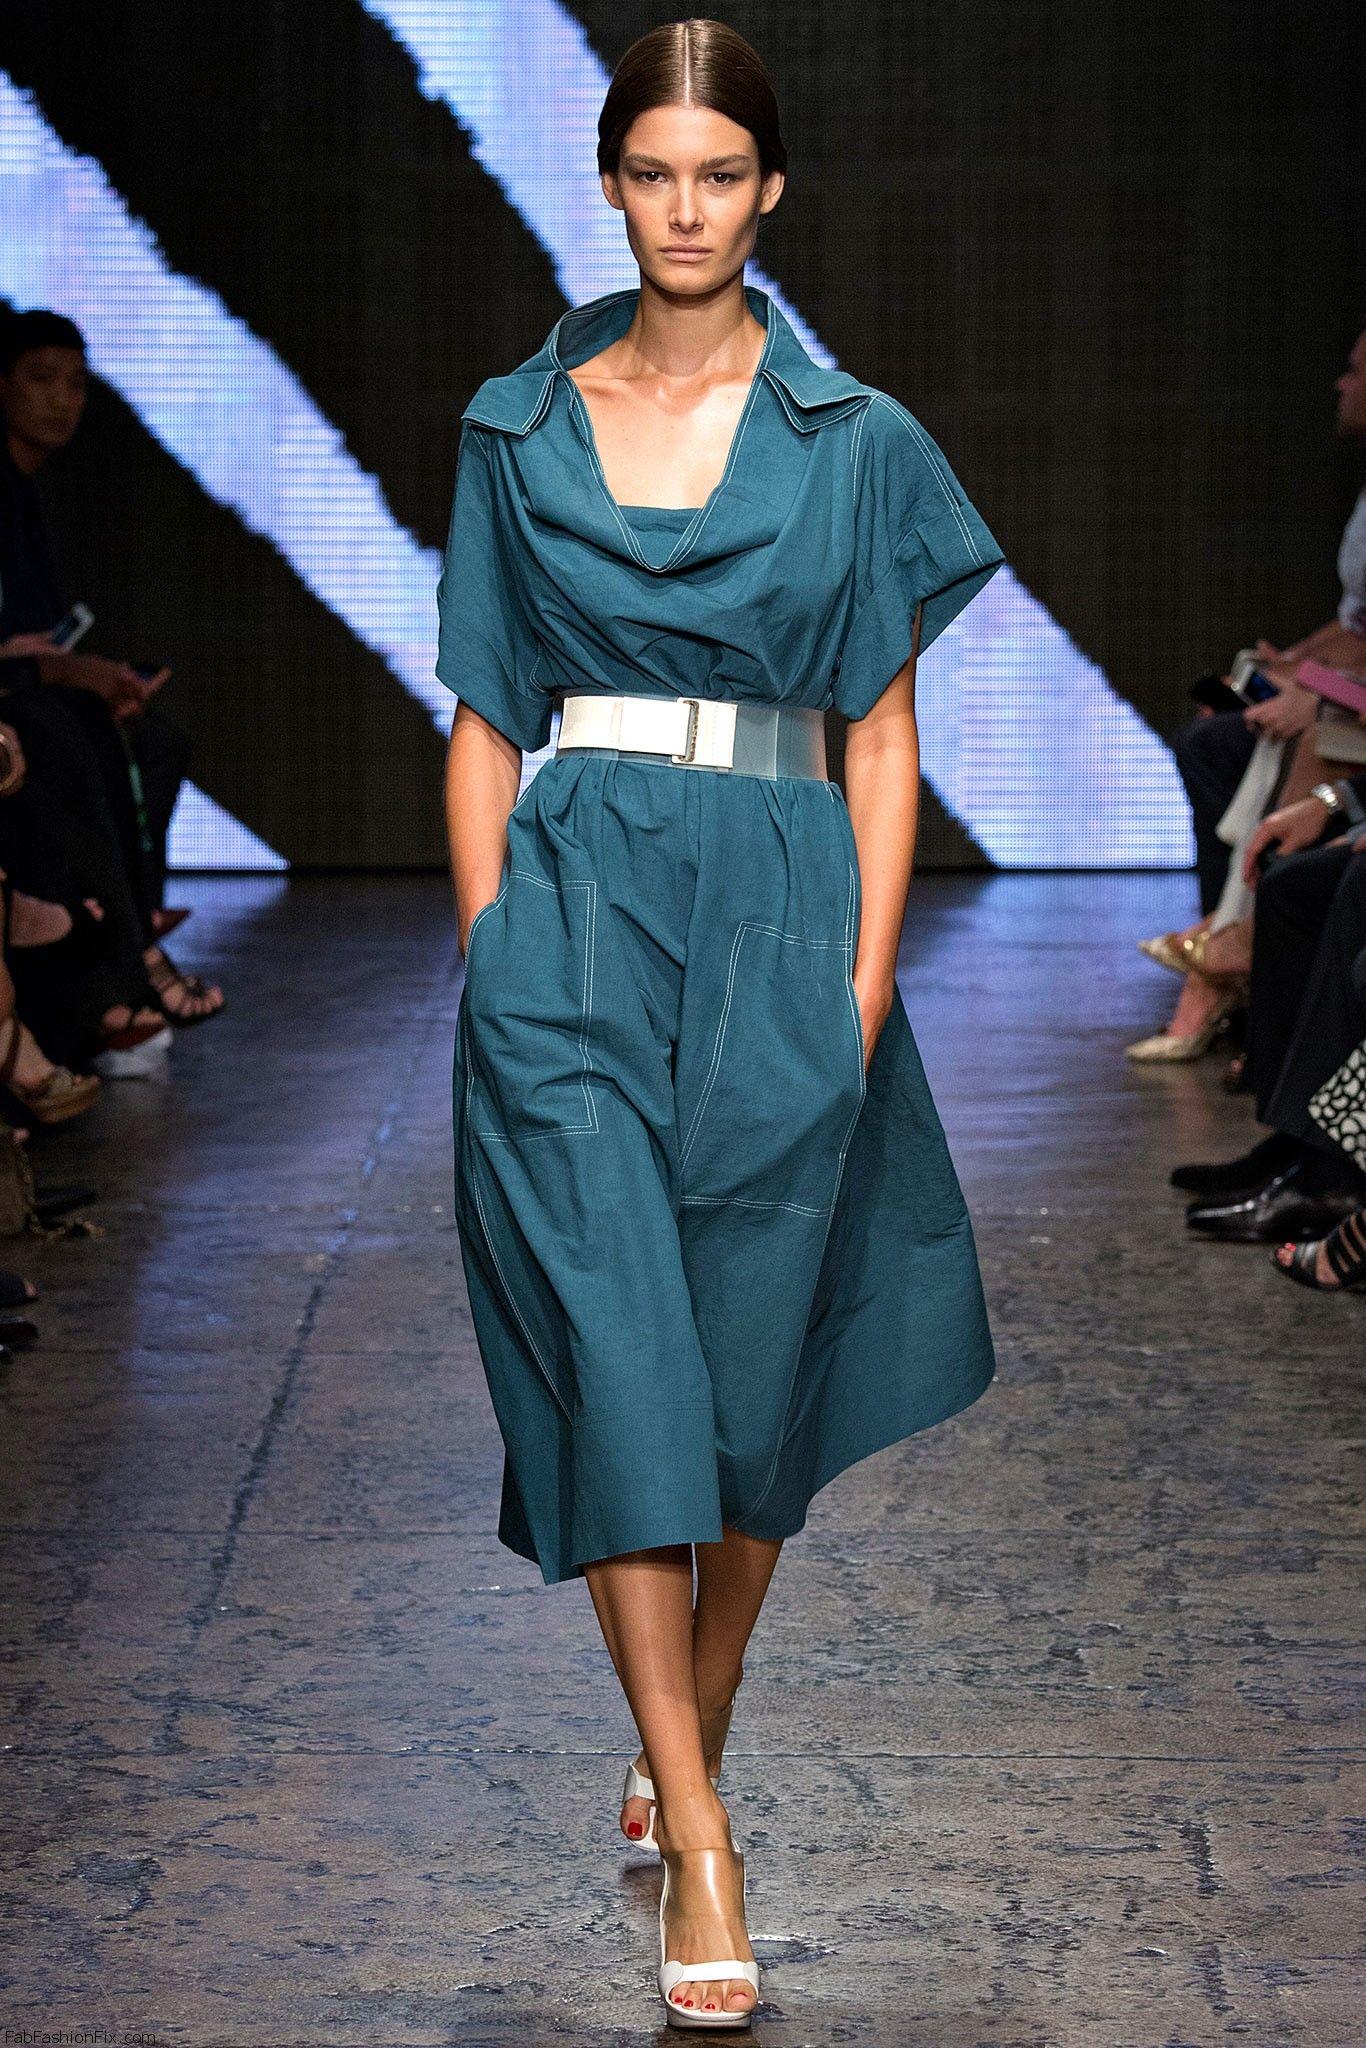 Donna Karan New York Spring/Summer 2009 Fashion Week